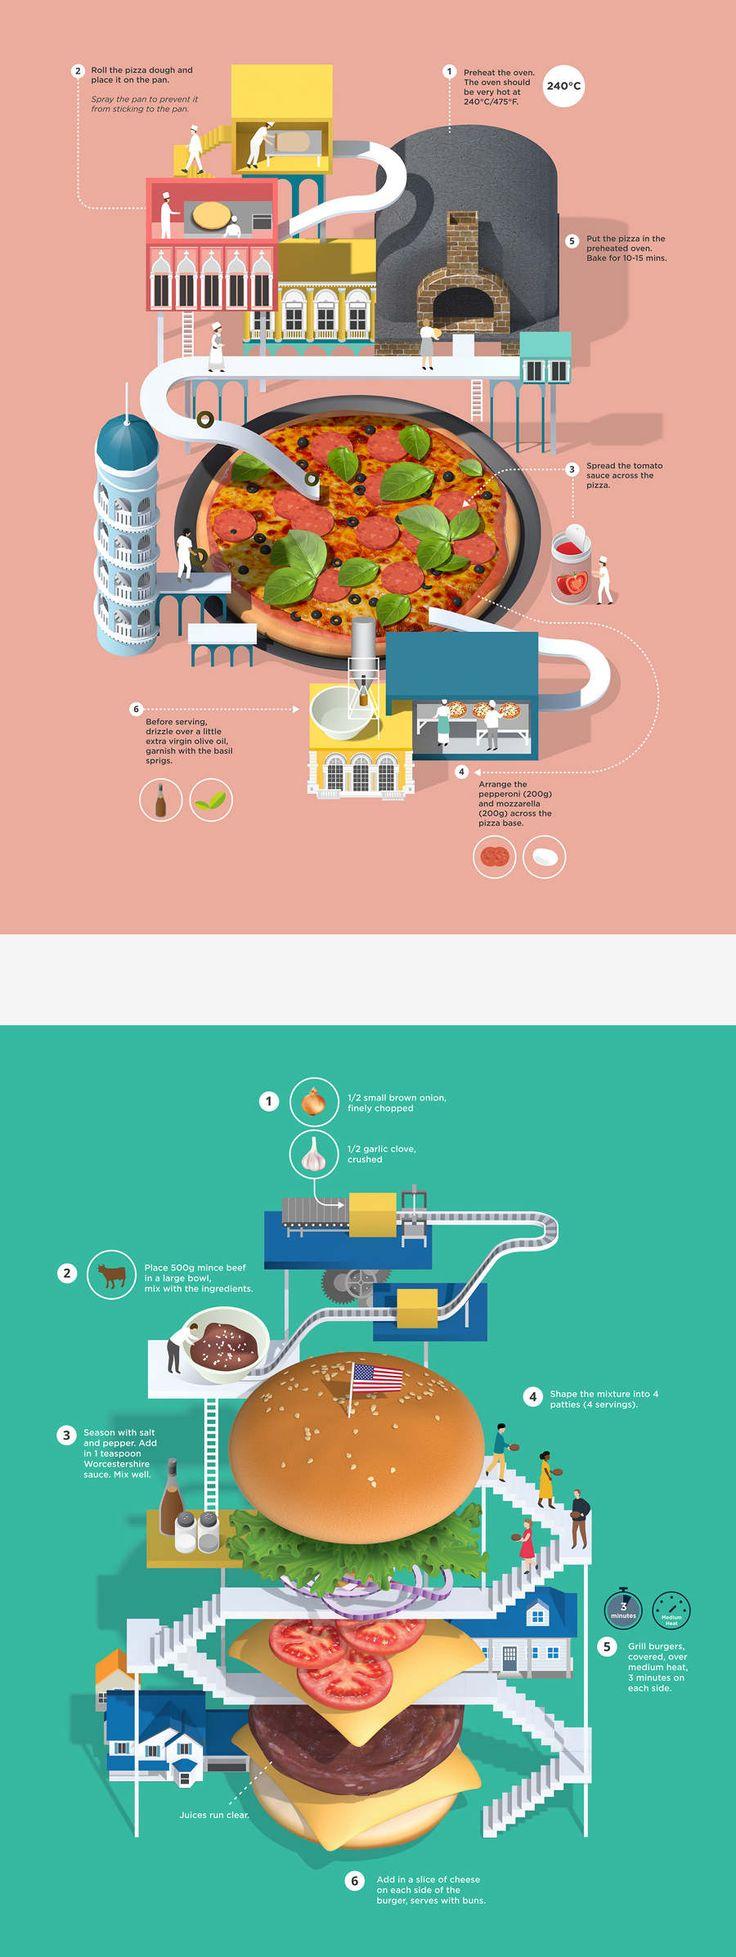 illustration, infographic, advertising illustration